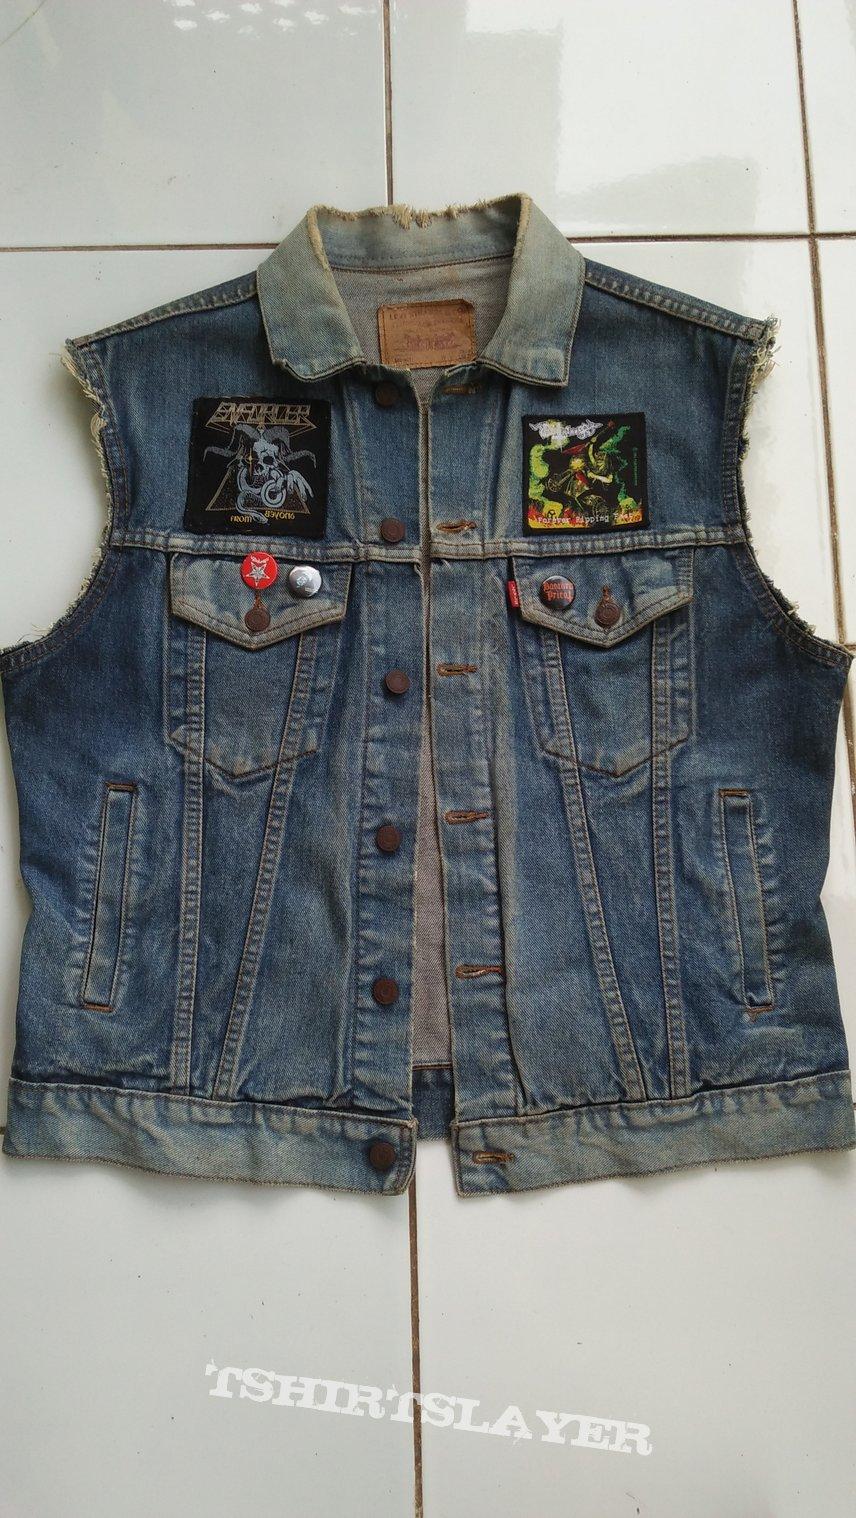 Simply vest